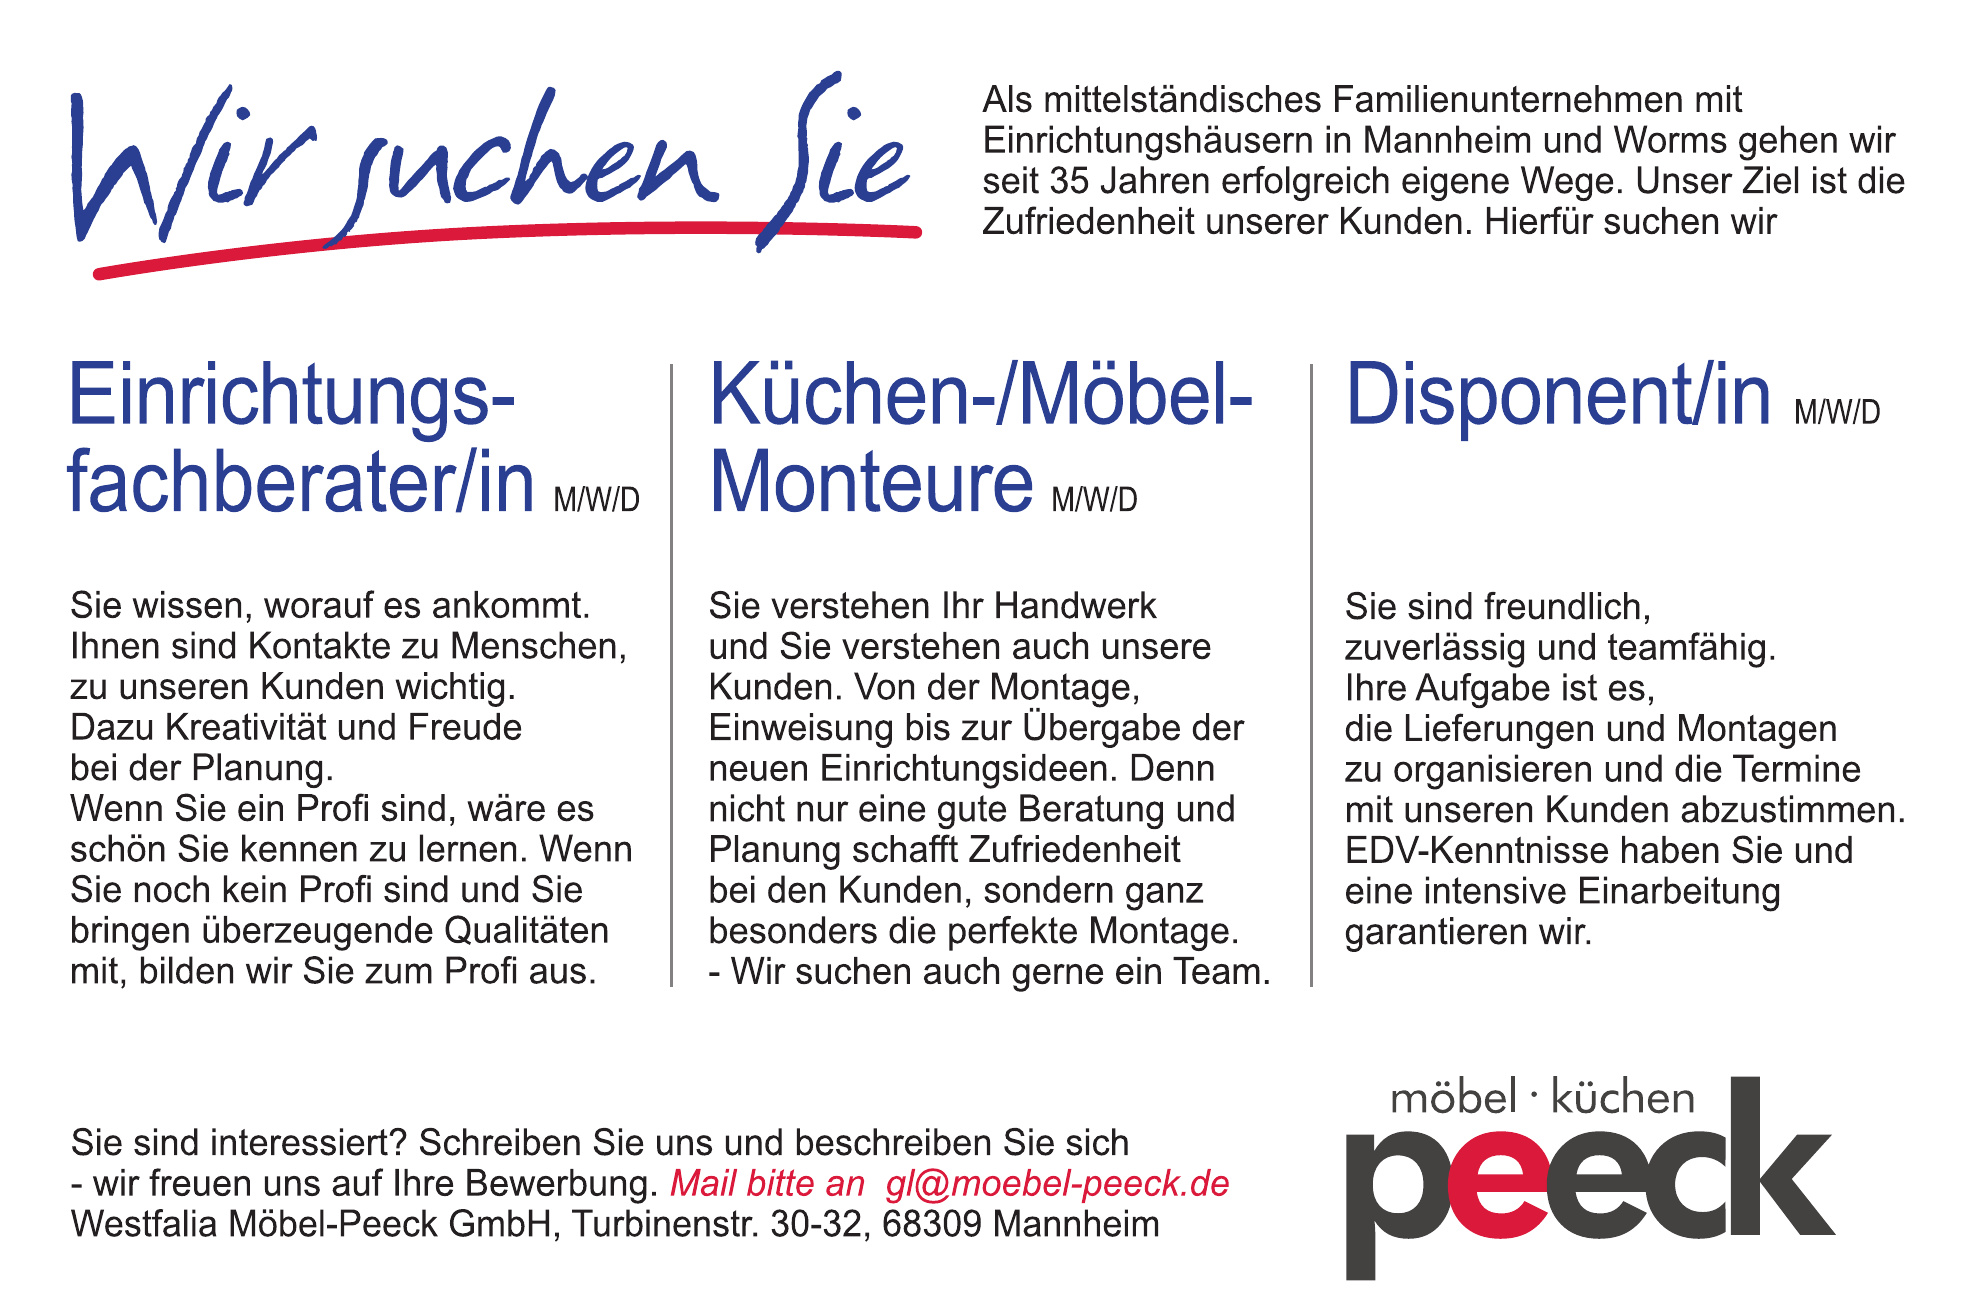 Möbel-Peek GmbH